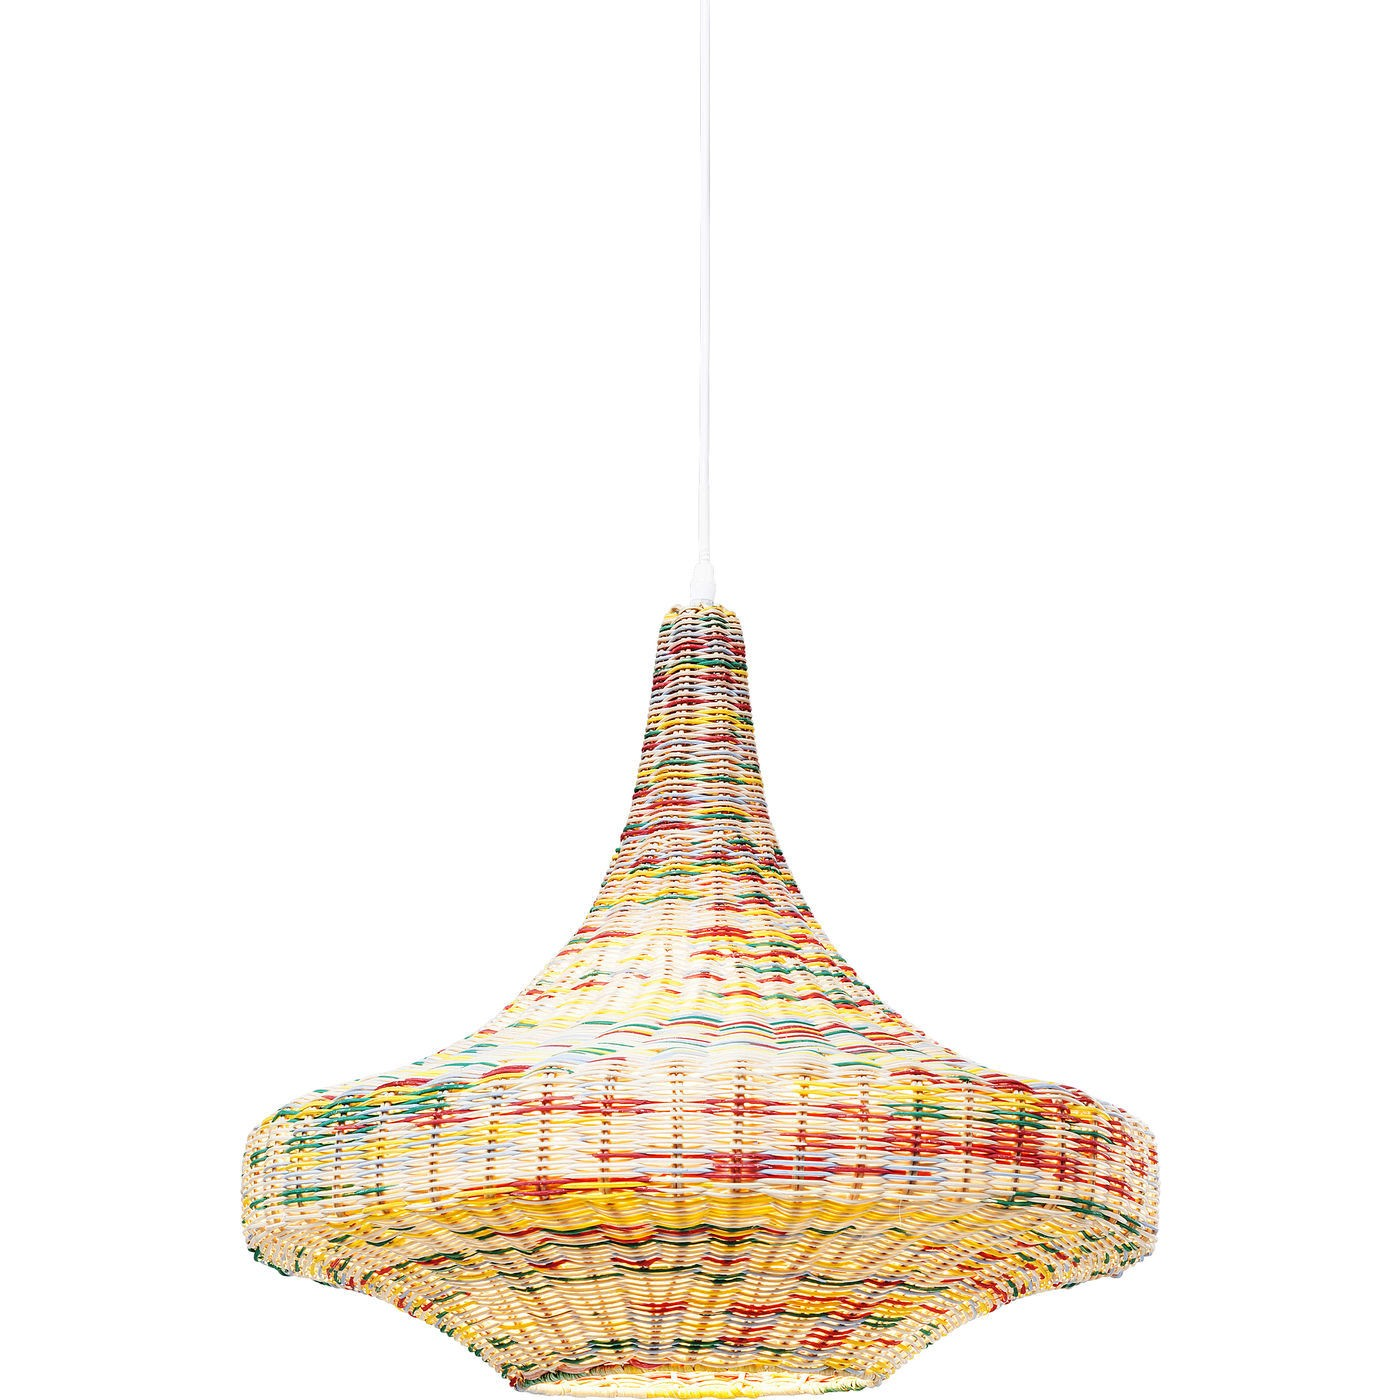 Rotan Hanglamp Ikea. Ikea Woonkamer Lamp Ikea Woonkamer Idee Smeley ...